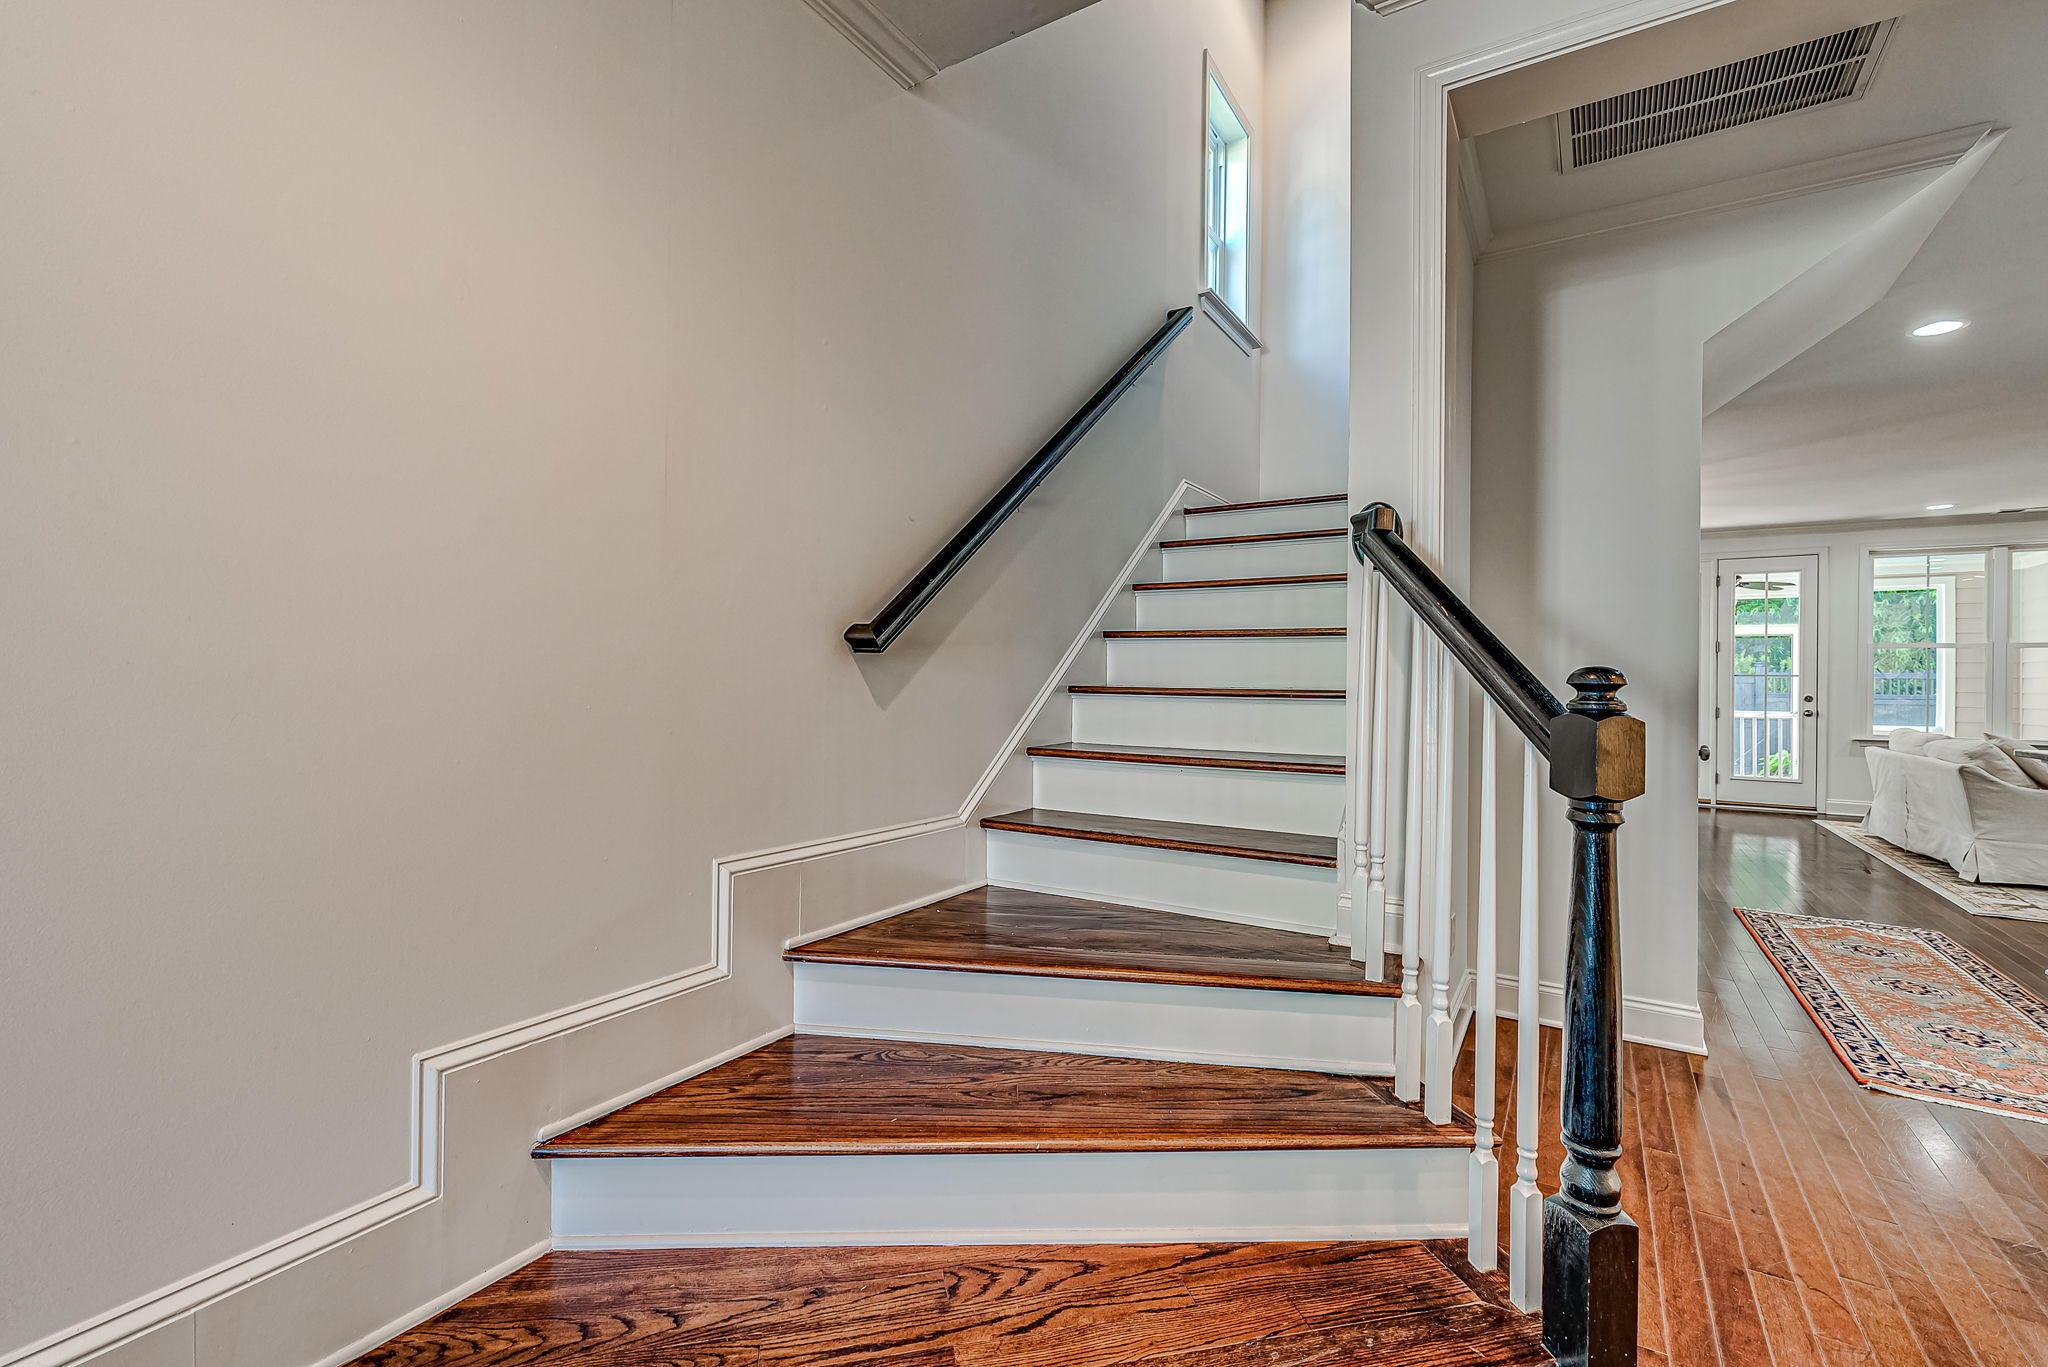 Dunes West Homes For Sale - 2476 Kings Gate, Mount Pleasant, SC - 23